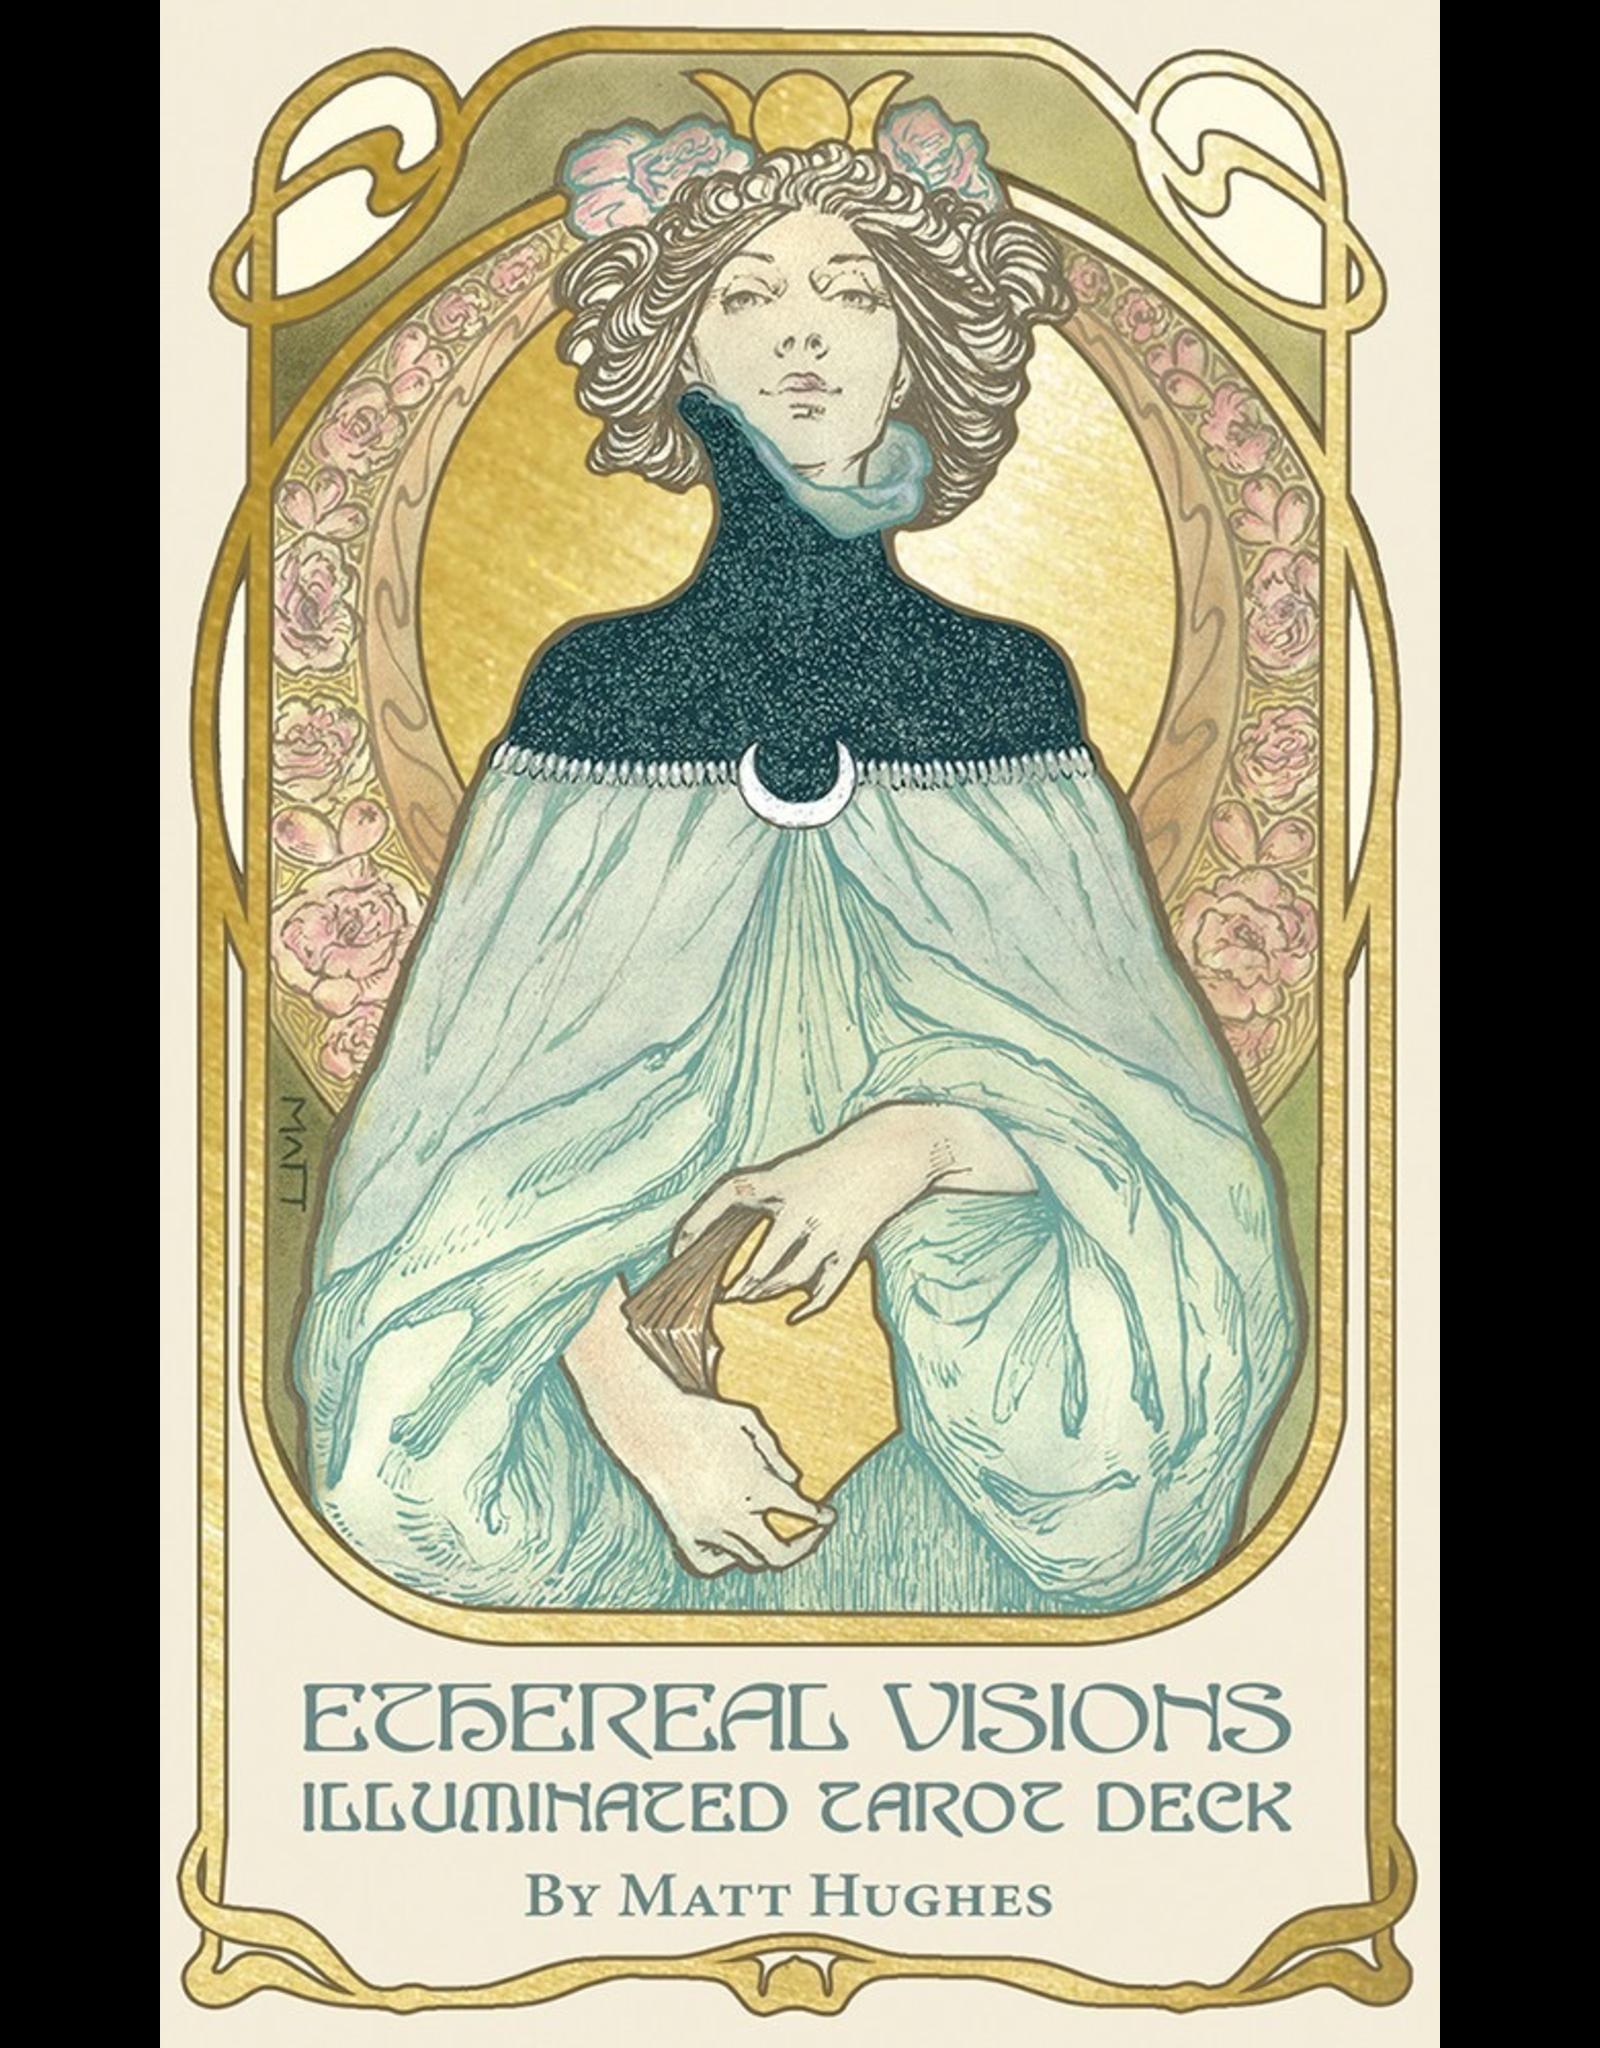 Ethereal Visions Illuminated Tarot Deck